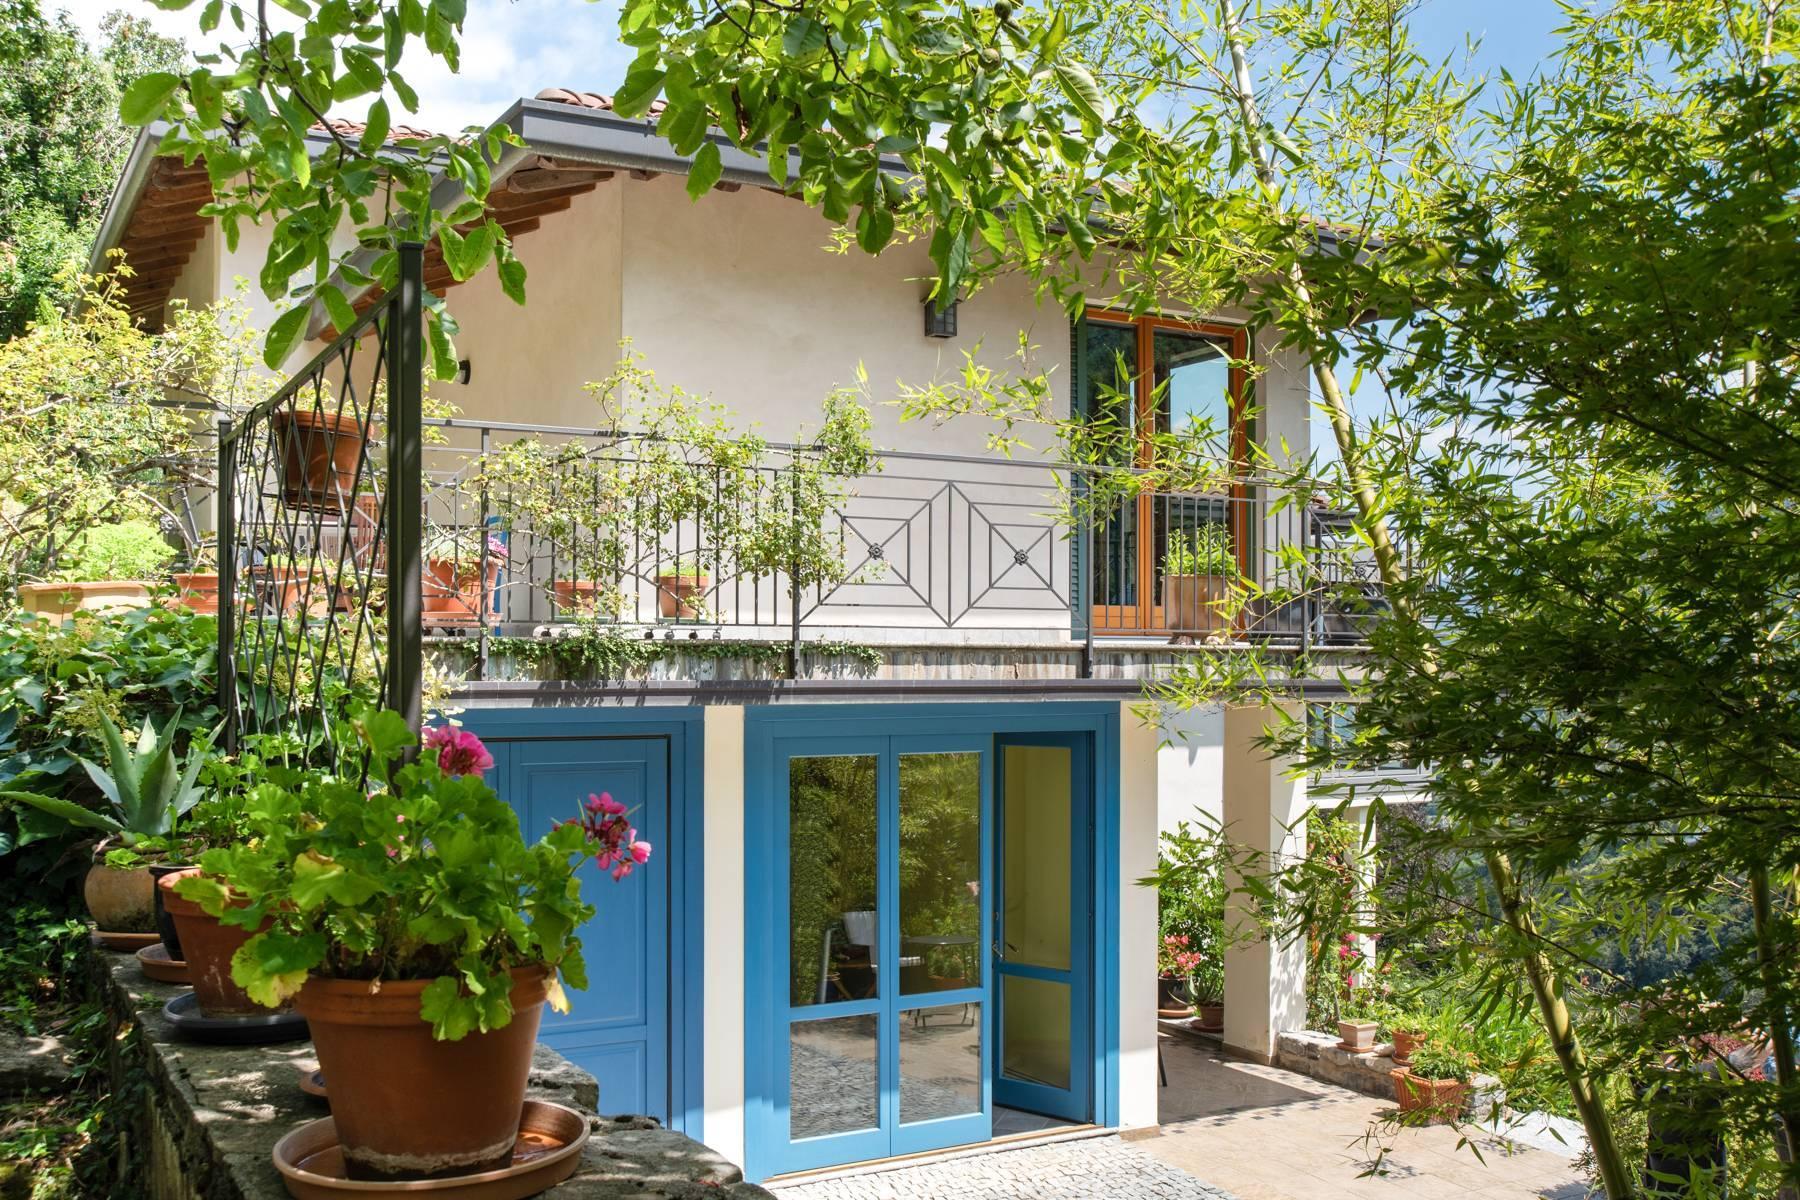 Splendida villa moderna sulla collina soleggiata sopra Argegno - 9